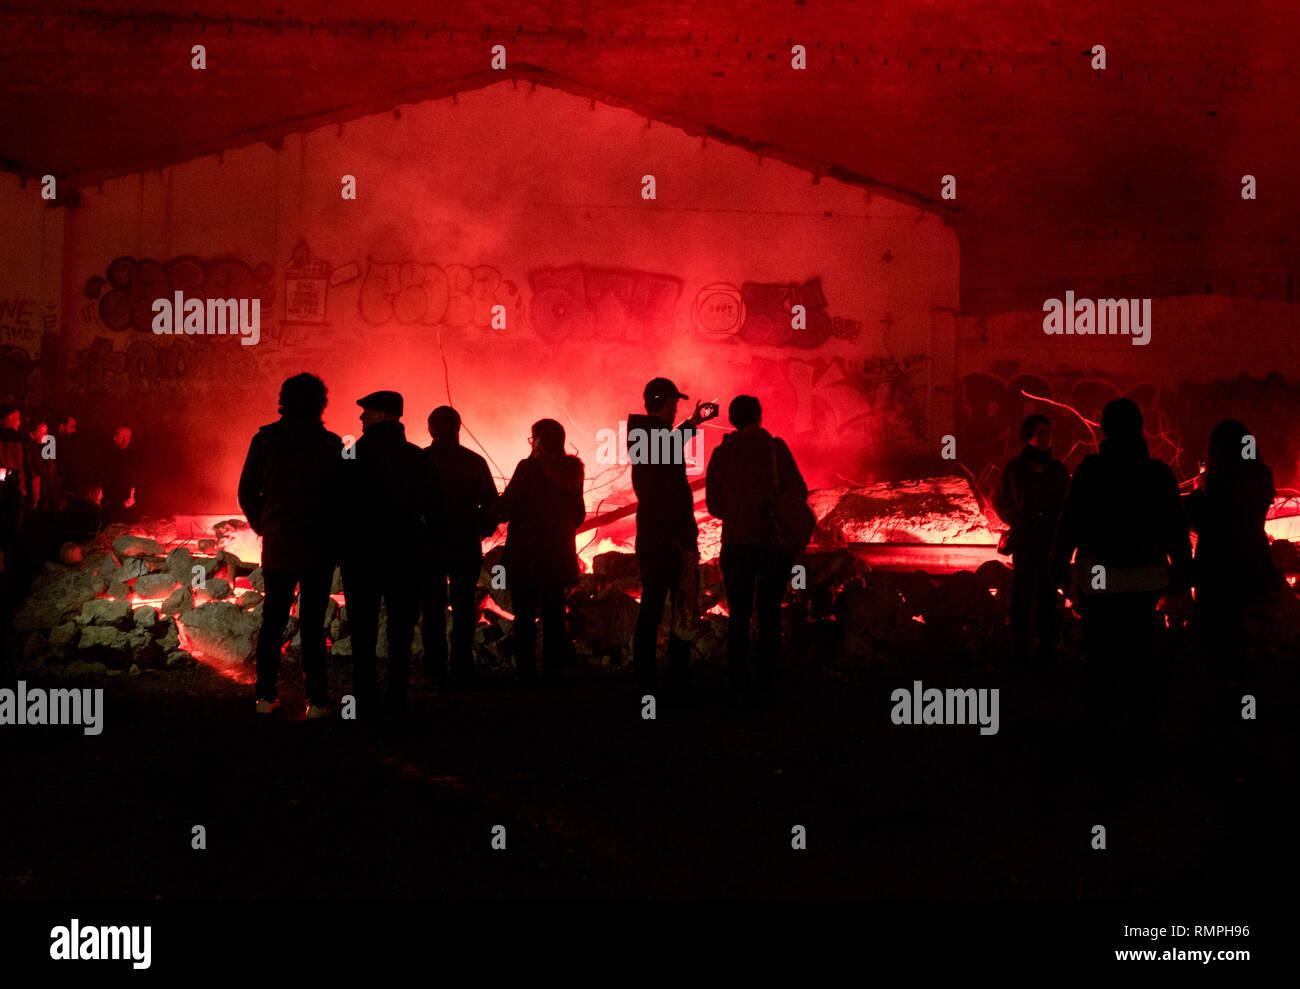 Barcelona, Spain. 15th Feb, 2019. -  People visit a light show installation during the Llum Bcn Festival. Credit:  Jordi Boixareu/Alamy Live News - Stock Image